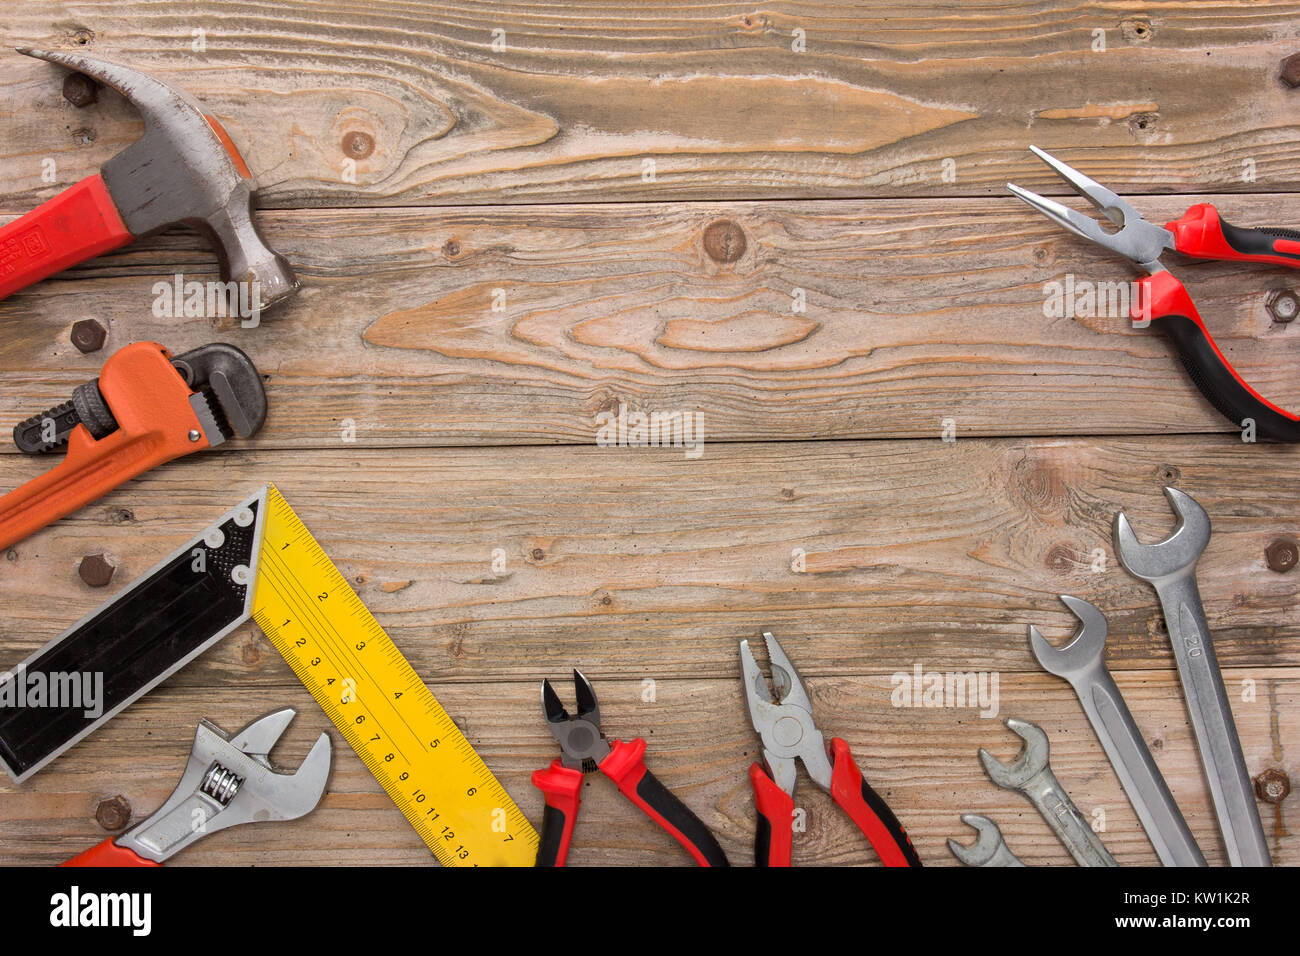 mechanical kit in wooden